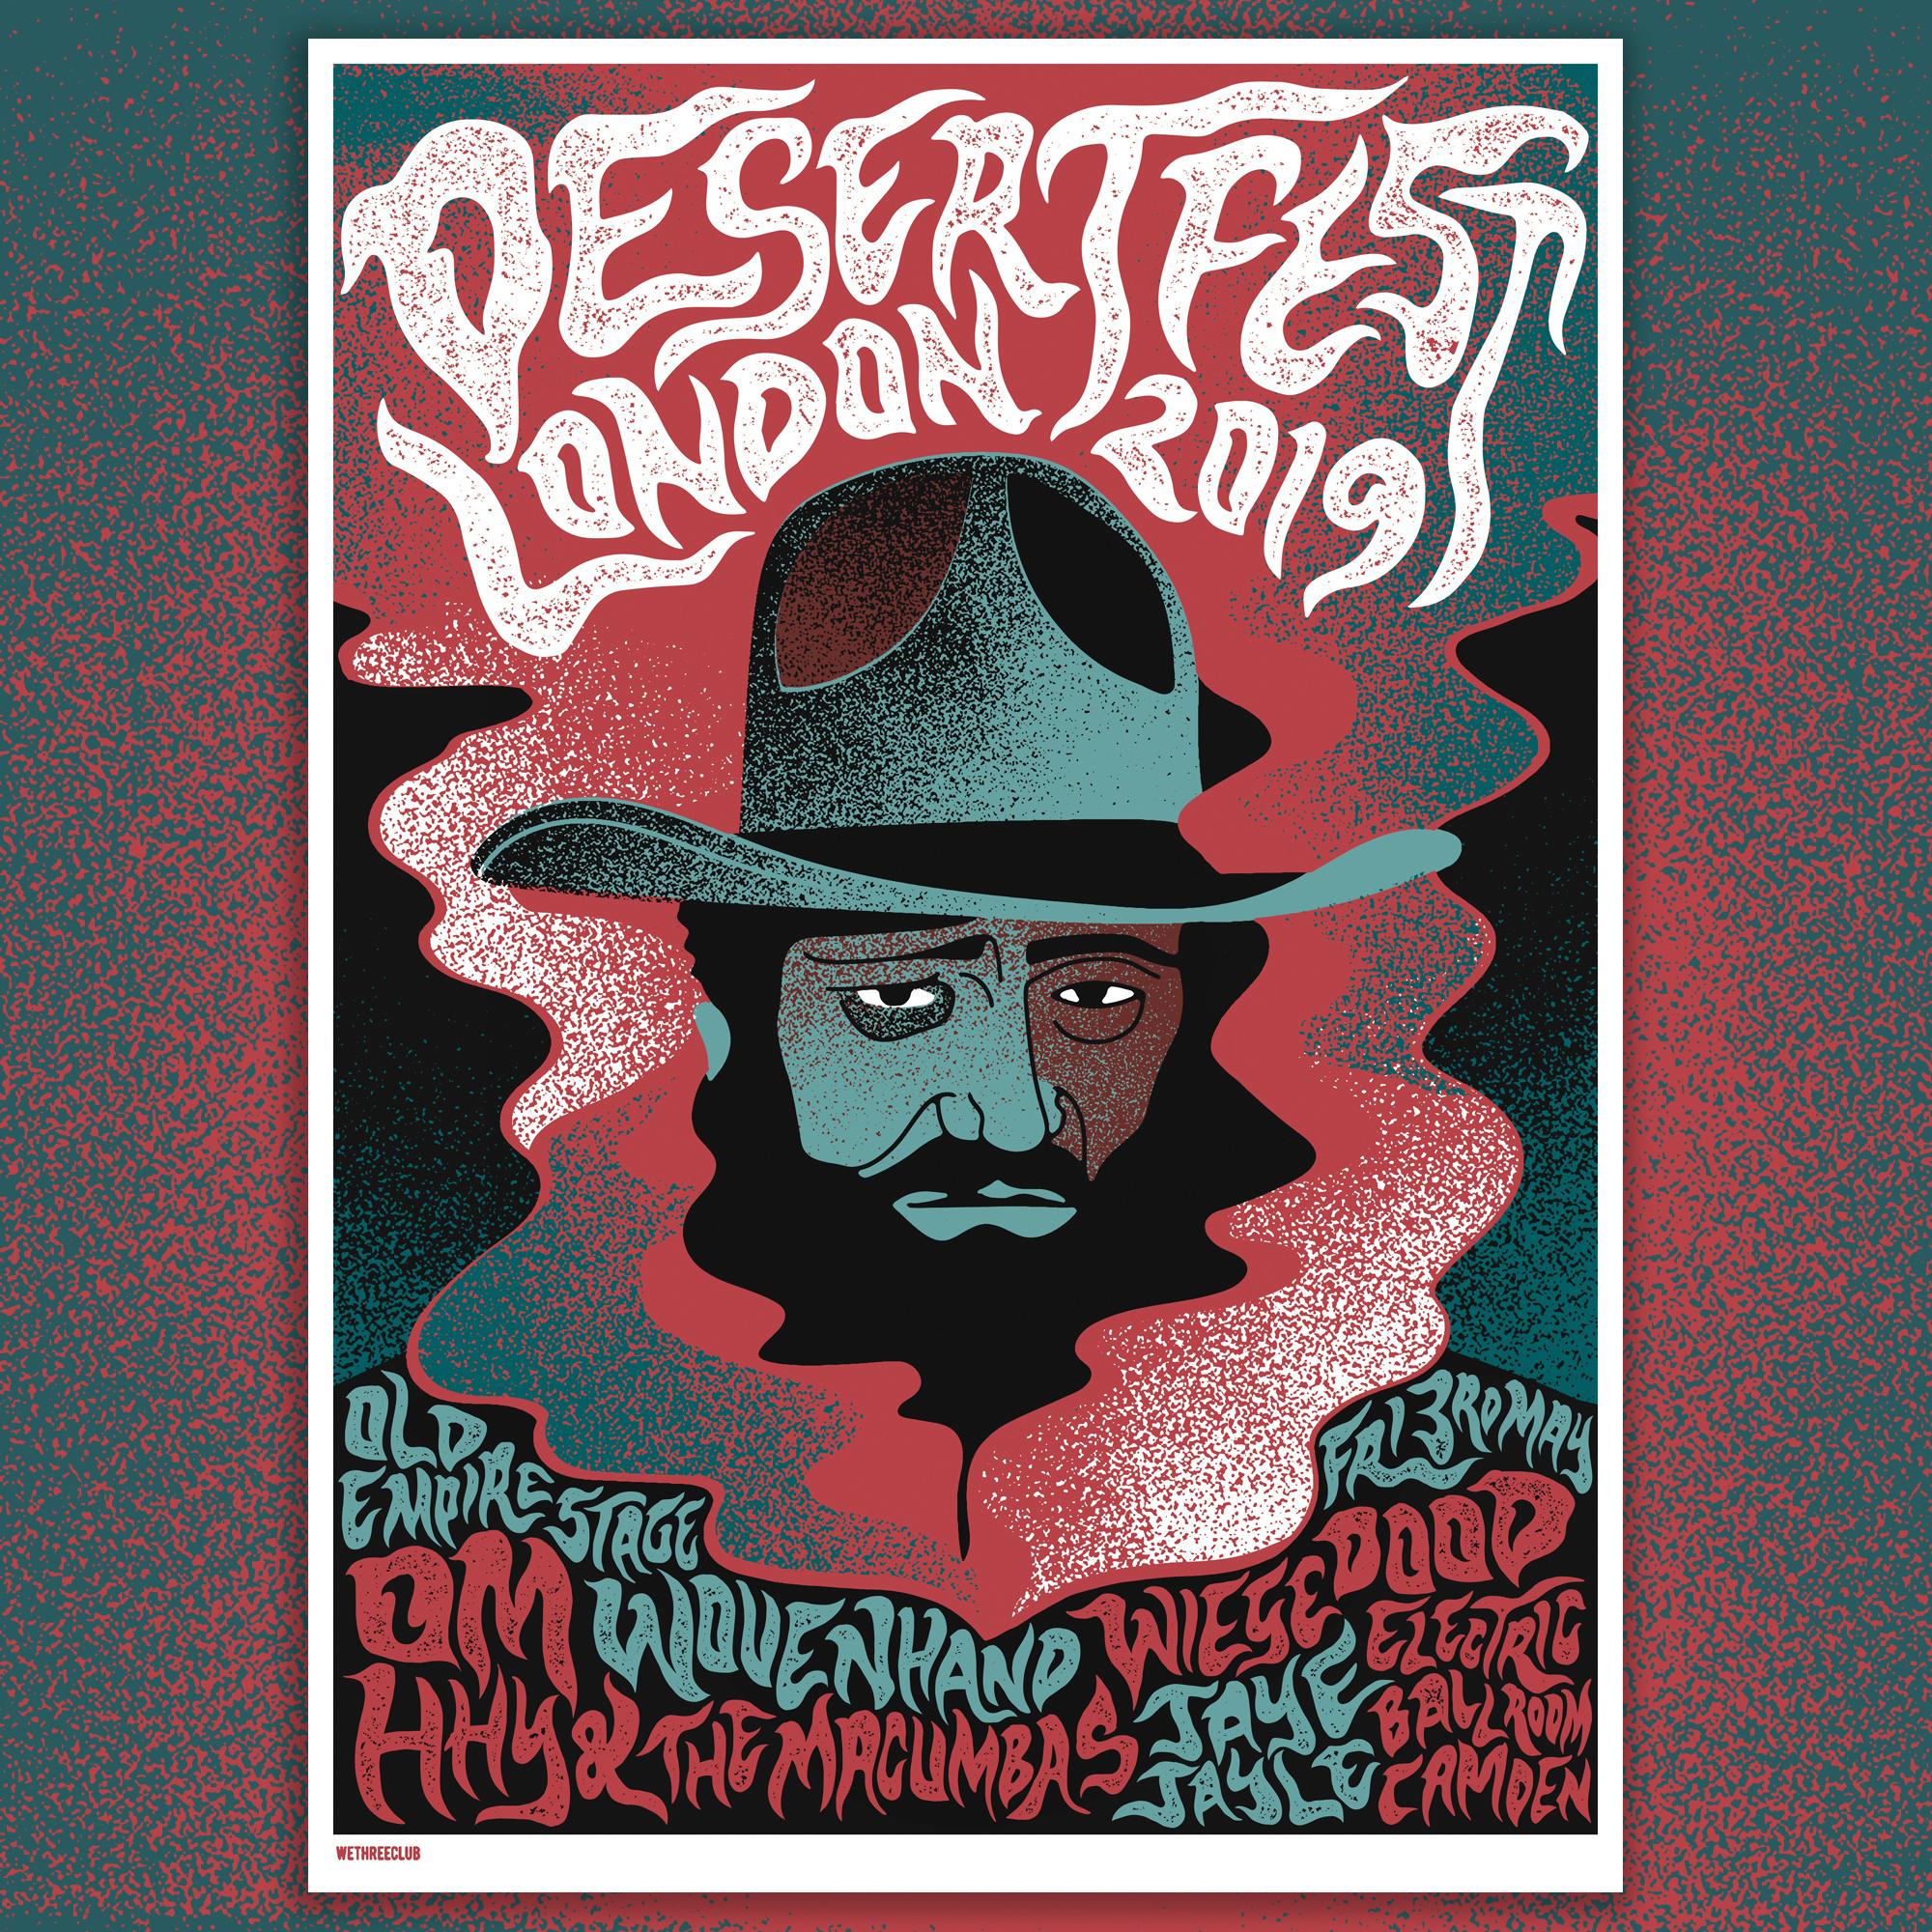 desertfest london 2019 old empire stage